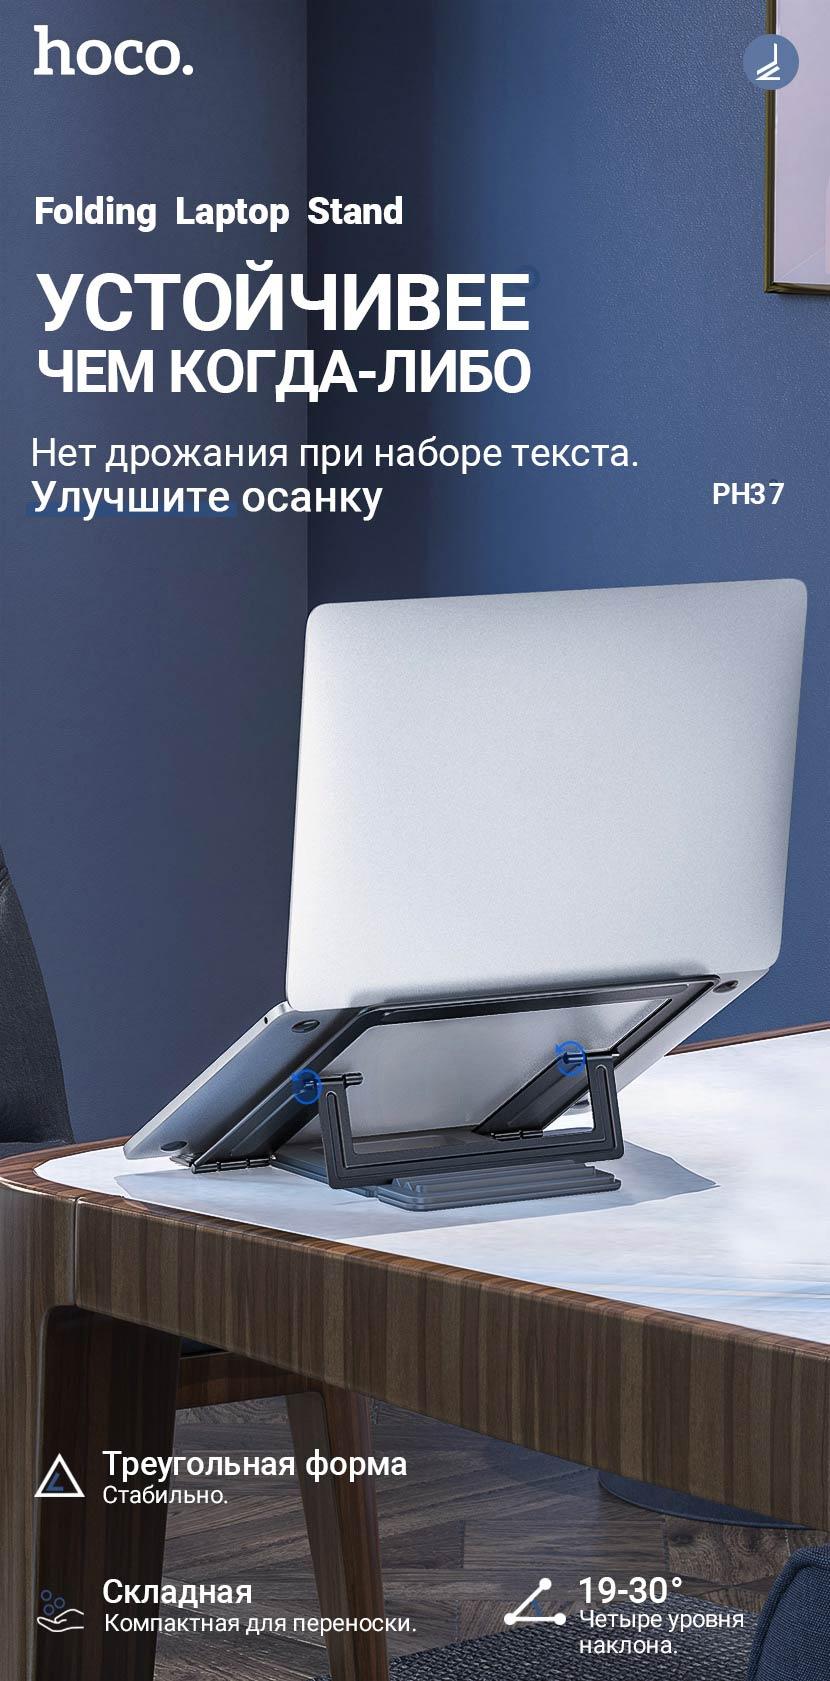 hoco news ph37 excellent aluminum alloy folding laptop stand ru